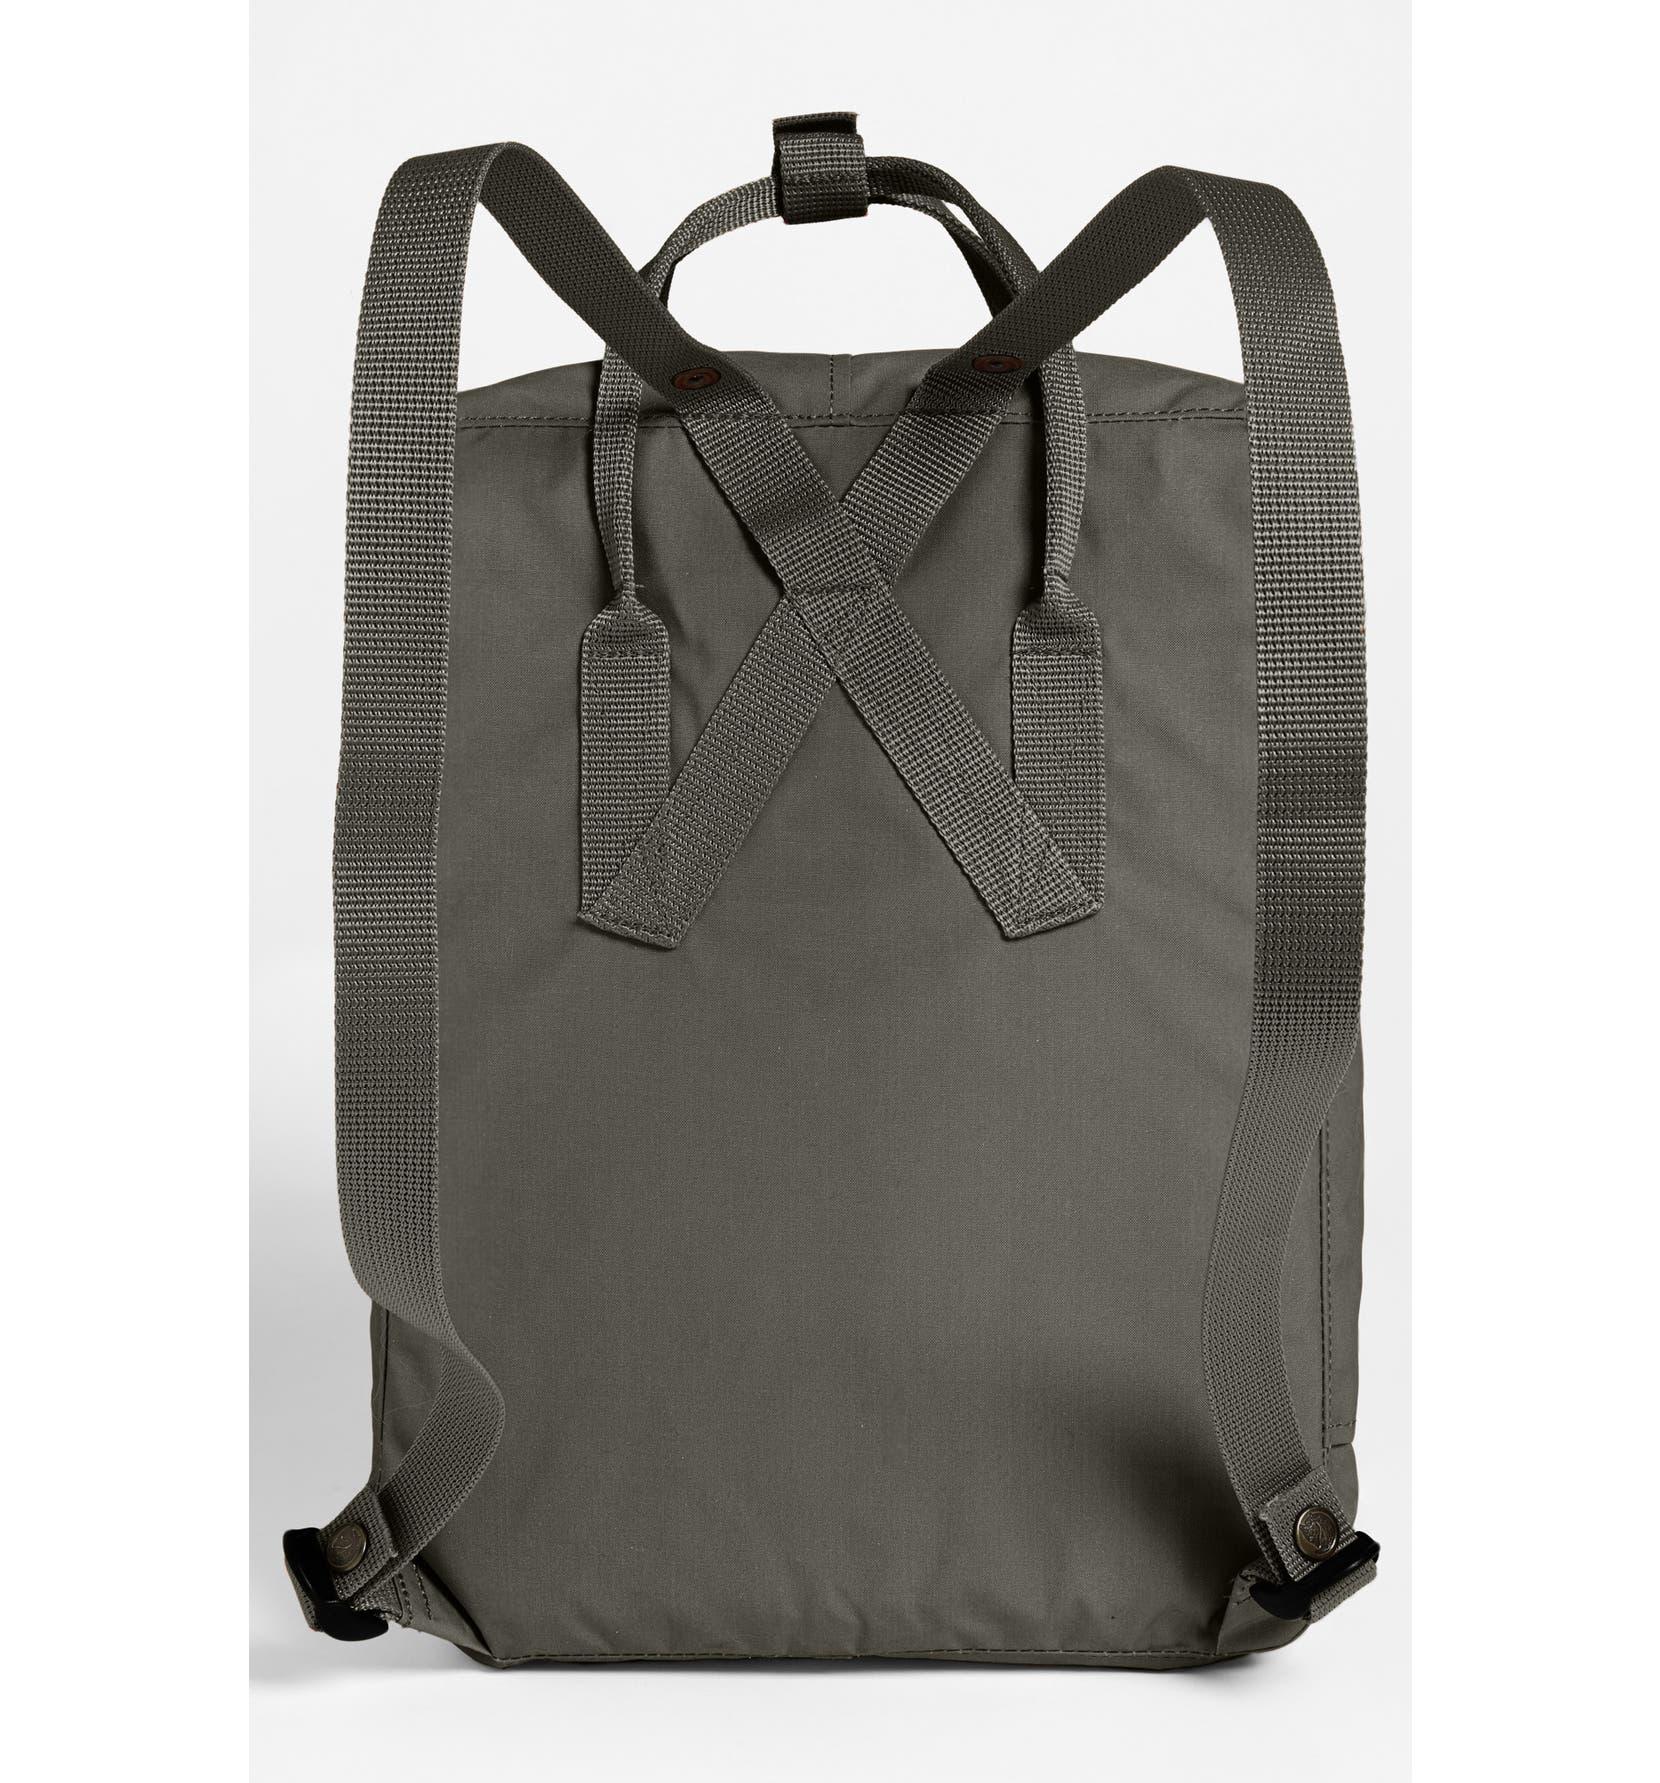 6fde498d081 Fjällräven Kånken Water Resistant Backpack